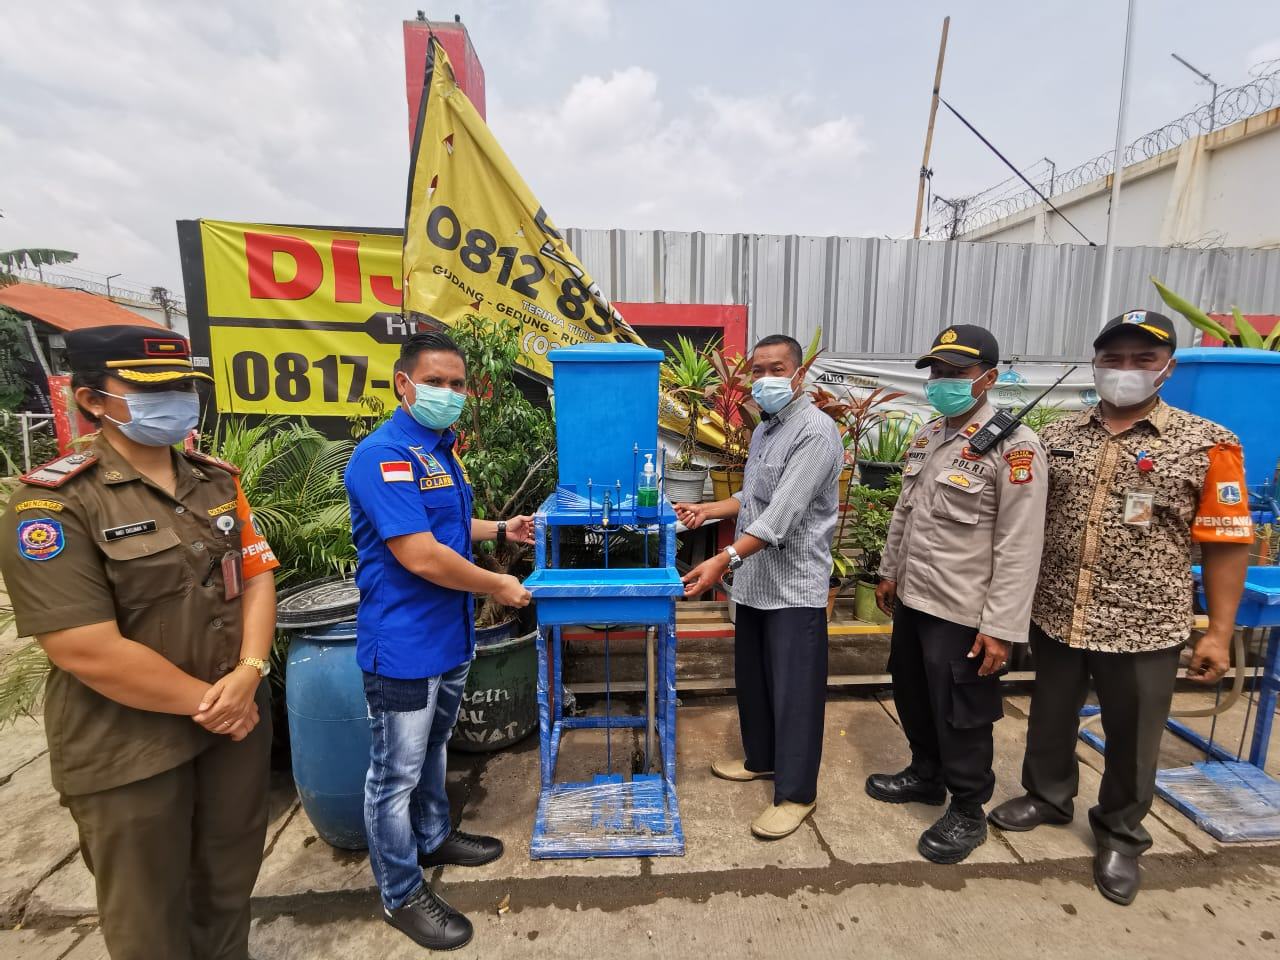 Sat Narkoba Polres Metro Jakarta Barat Resmikan Kampung tangguh Jaya di Rw 11 Cengkareng Timur